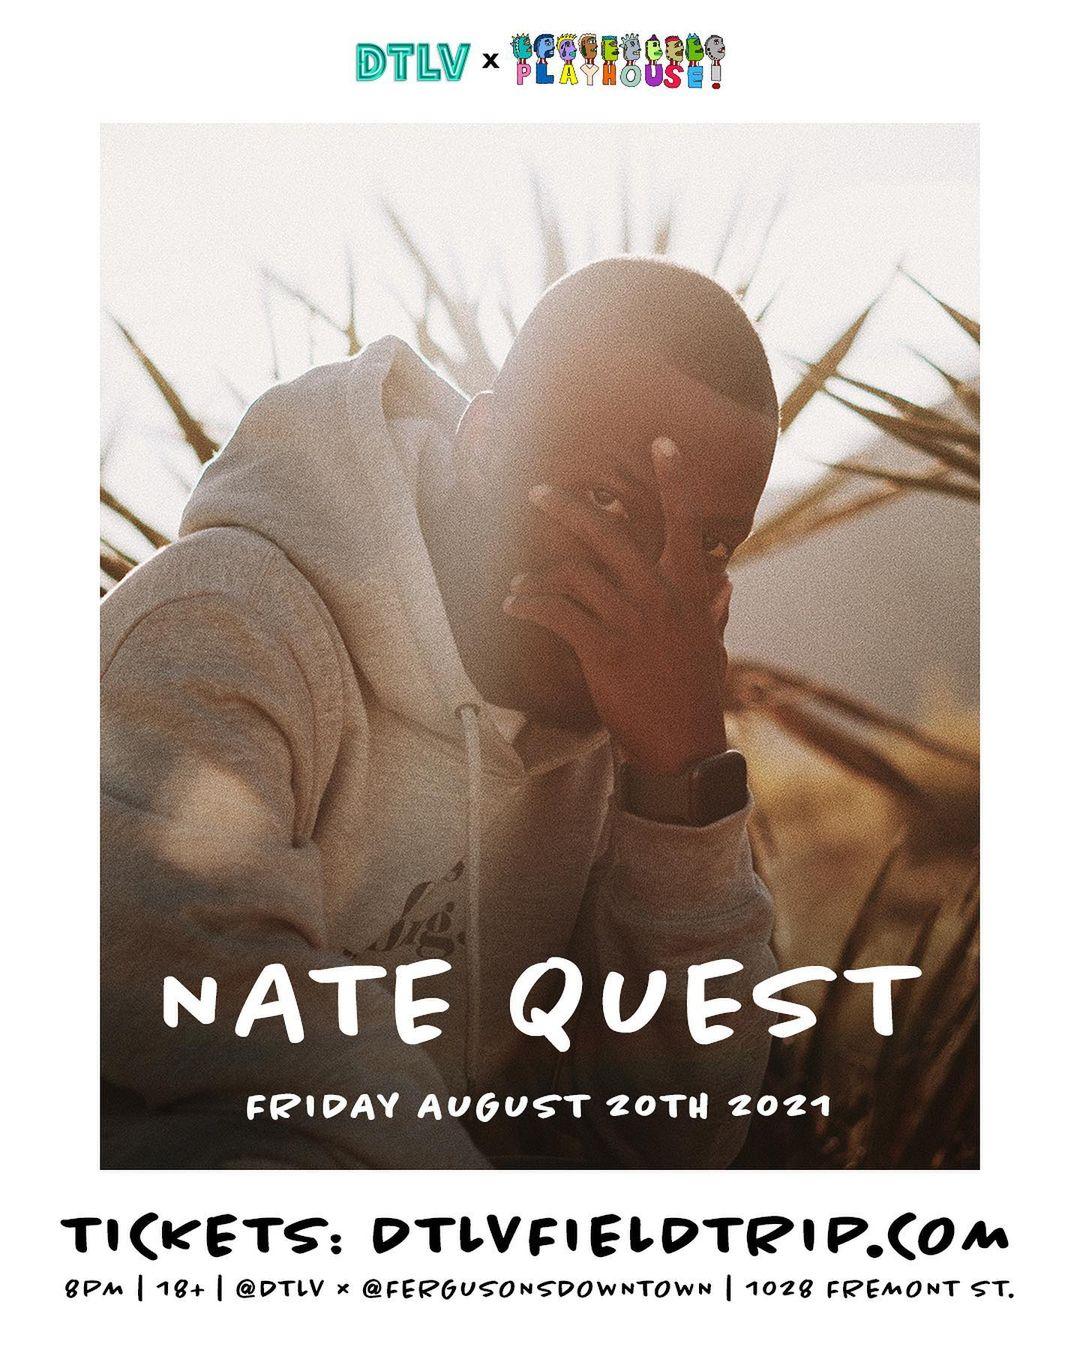 Nate Quest DTLV